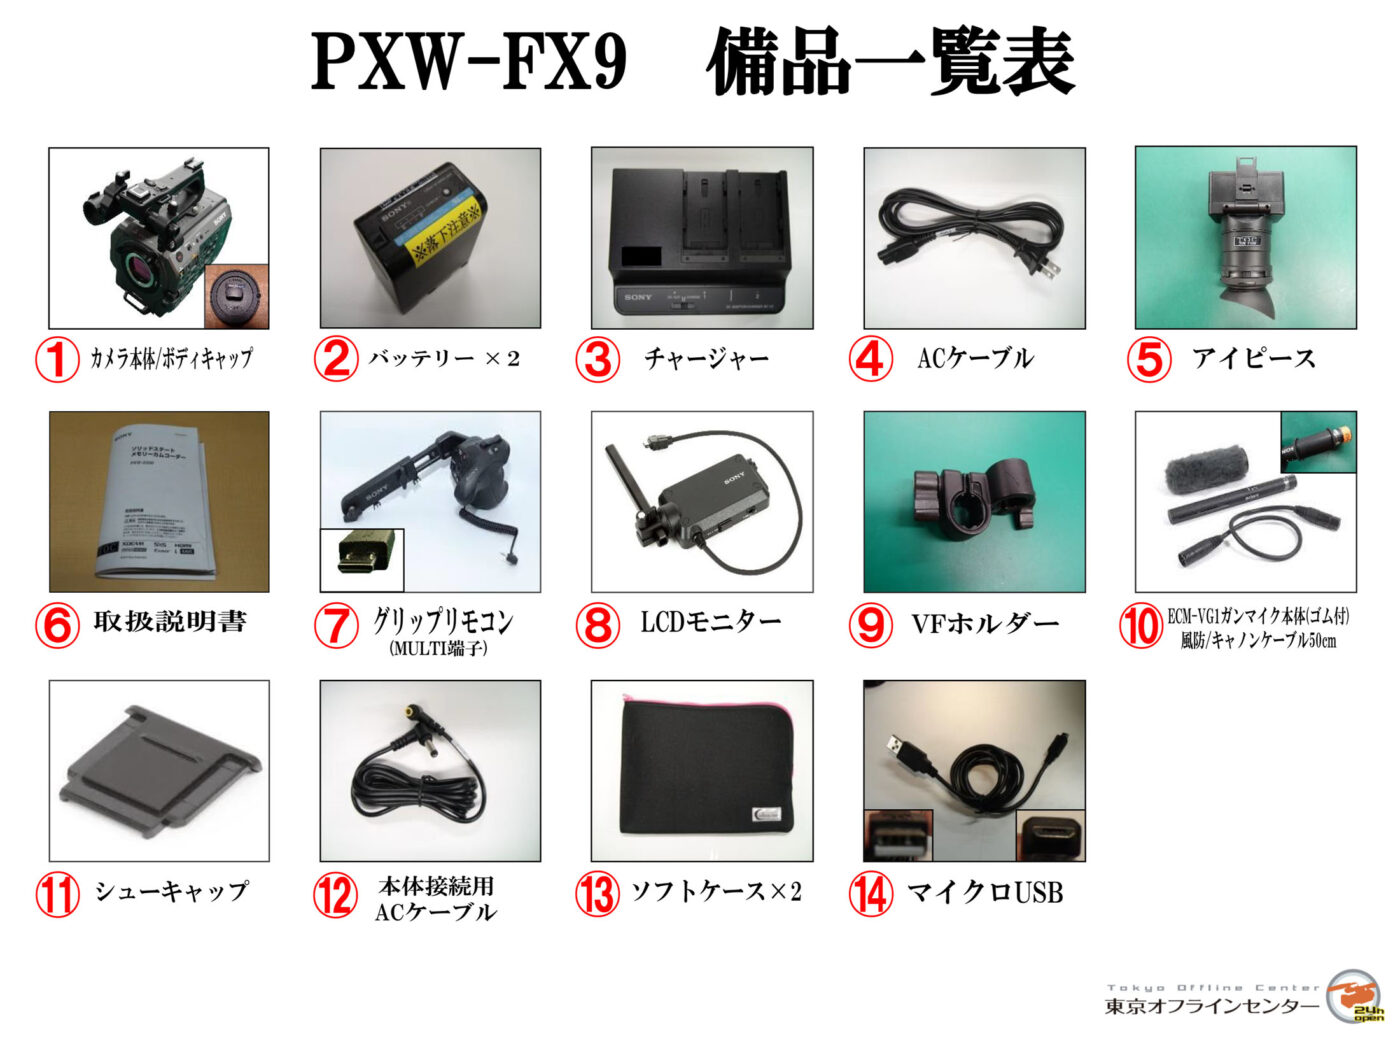 SONY PXW-FX9 備品一覧